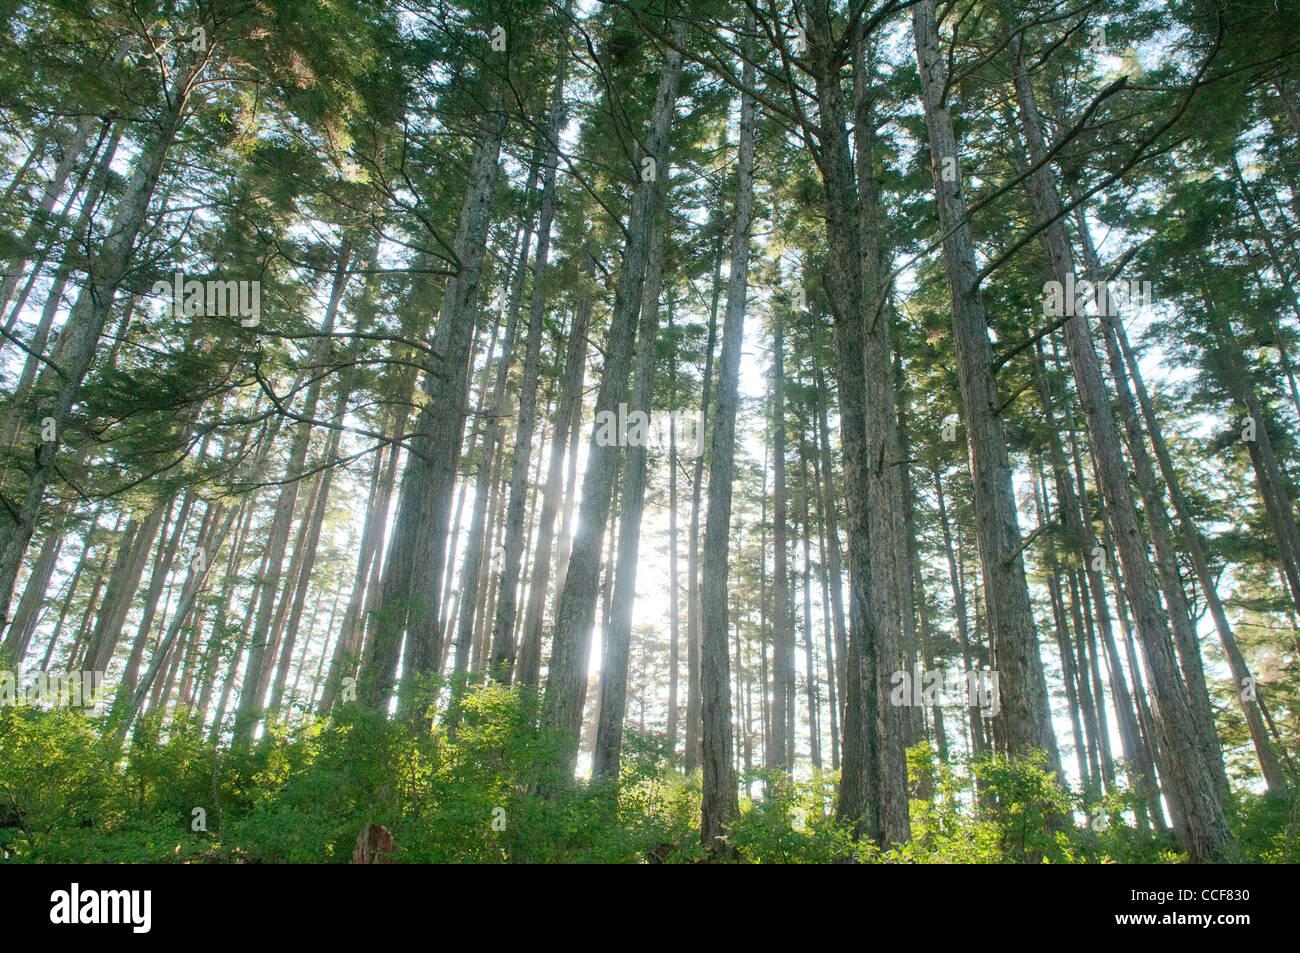 Forest on Bamdoroshni Island, Sitka, Alaska - Stock Image